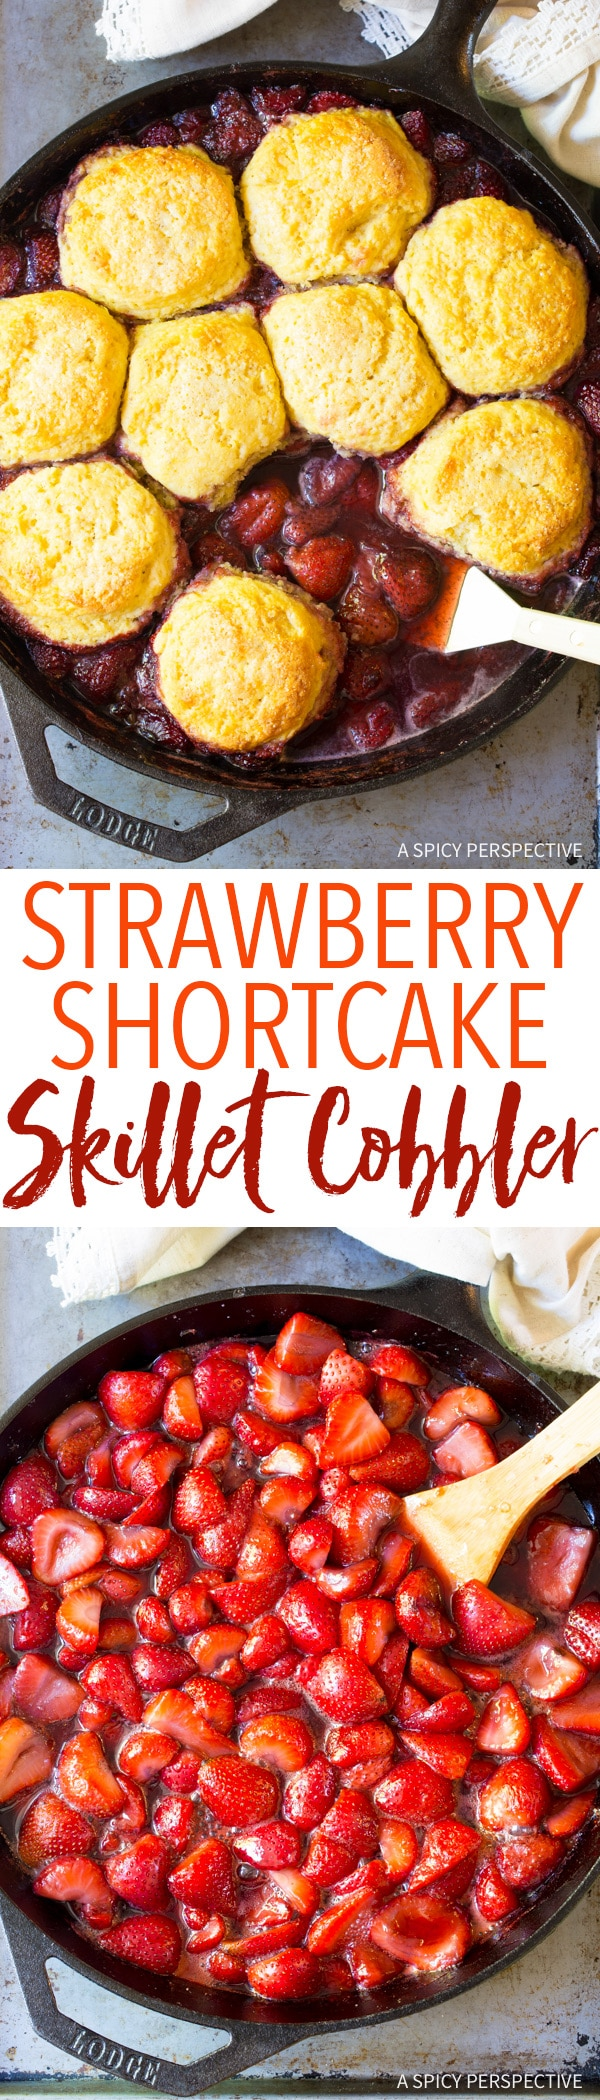 Roasted Strawberry Shortcake Skillet Cobbler Recipe